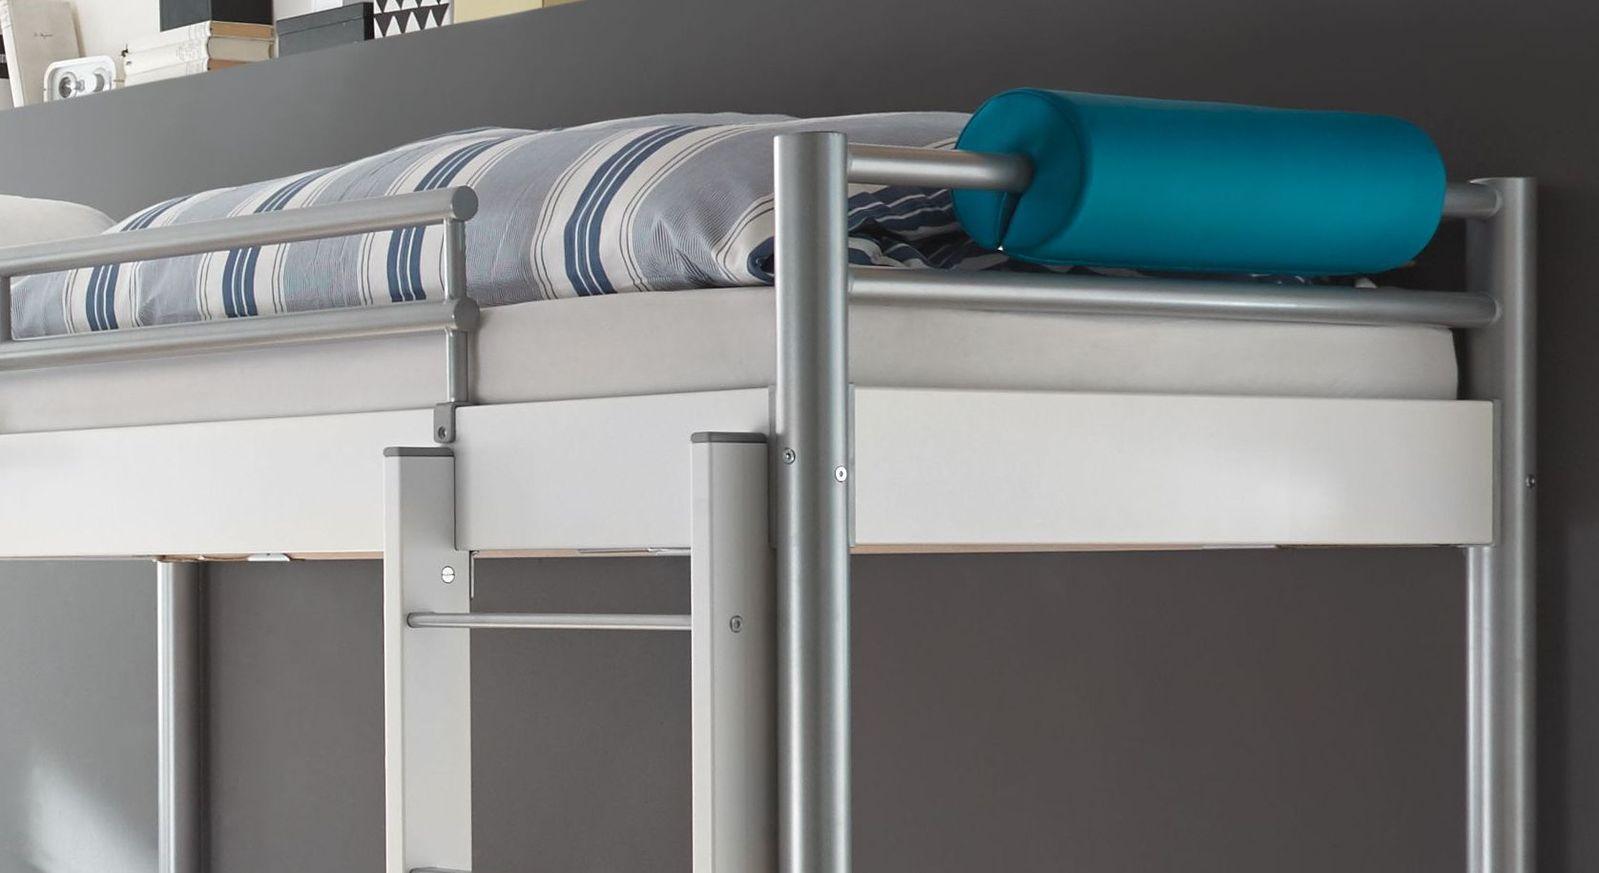 Etagenbett Metall Günstig : Stabiles etagenbett aus metall mit wählbarem dekor jan